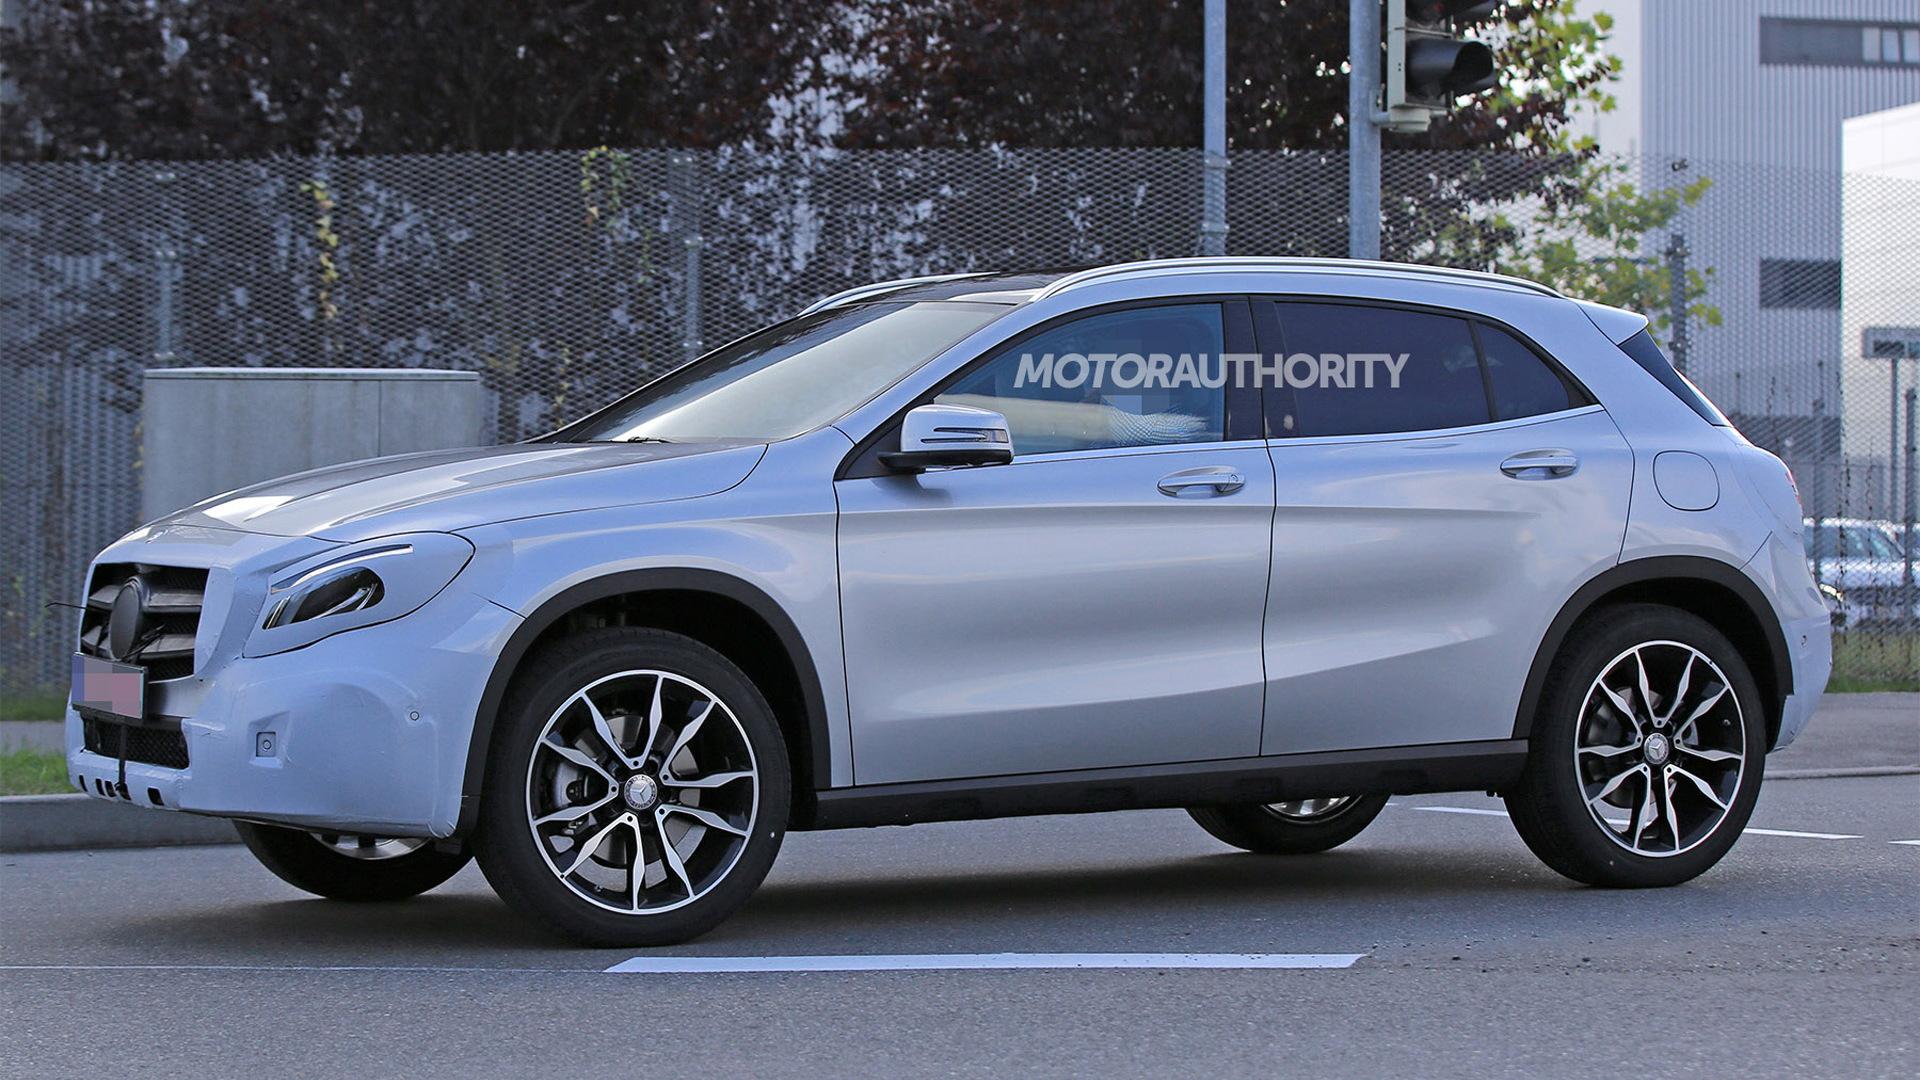 2018 Mercedes-Benz GLA facelift spy shots - Image via S. Baldauf/SB-Medien